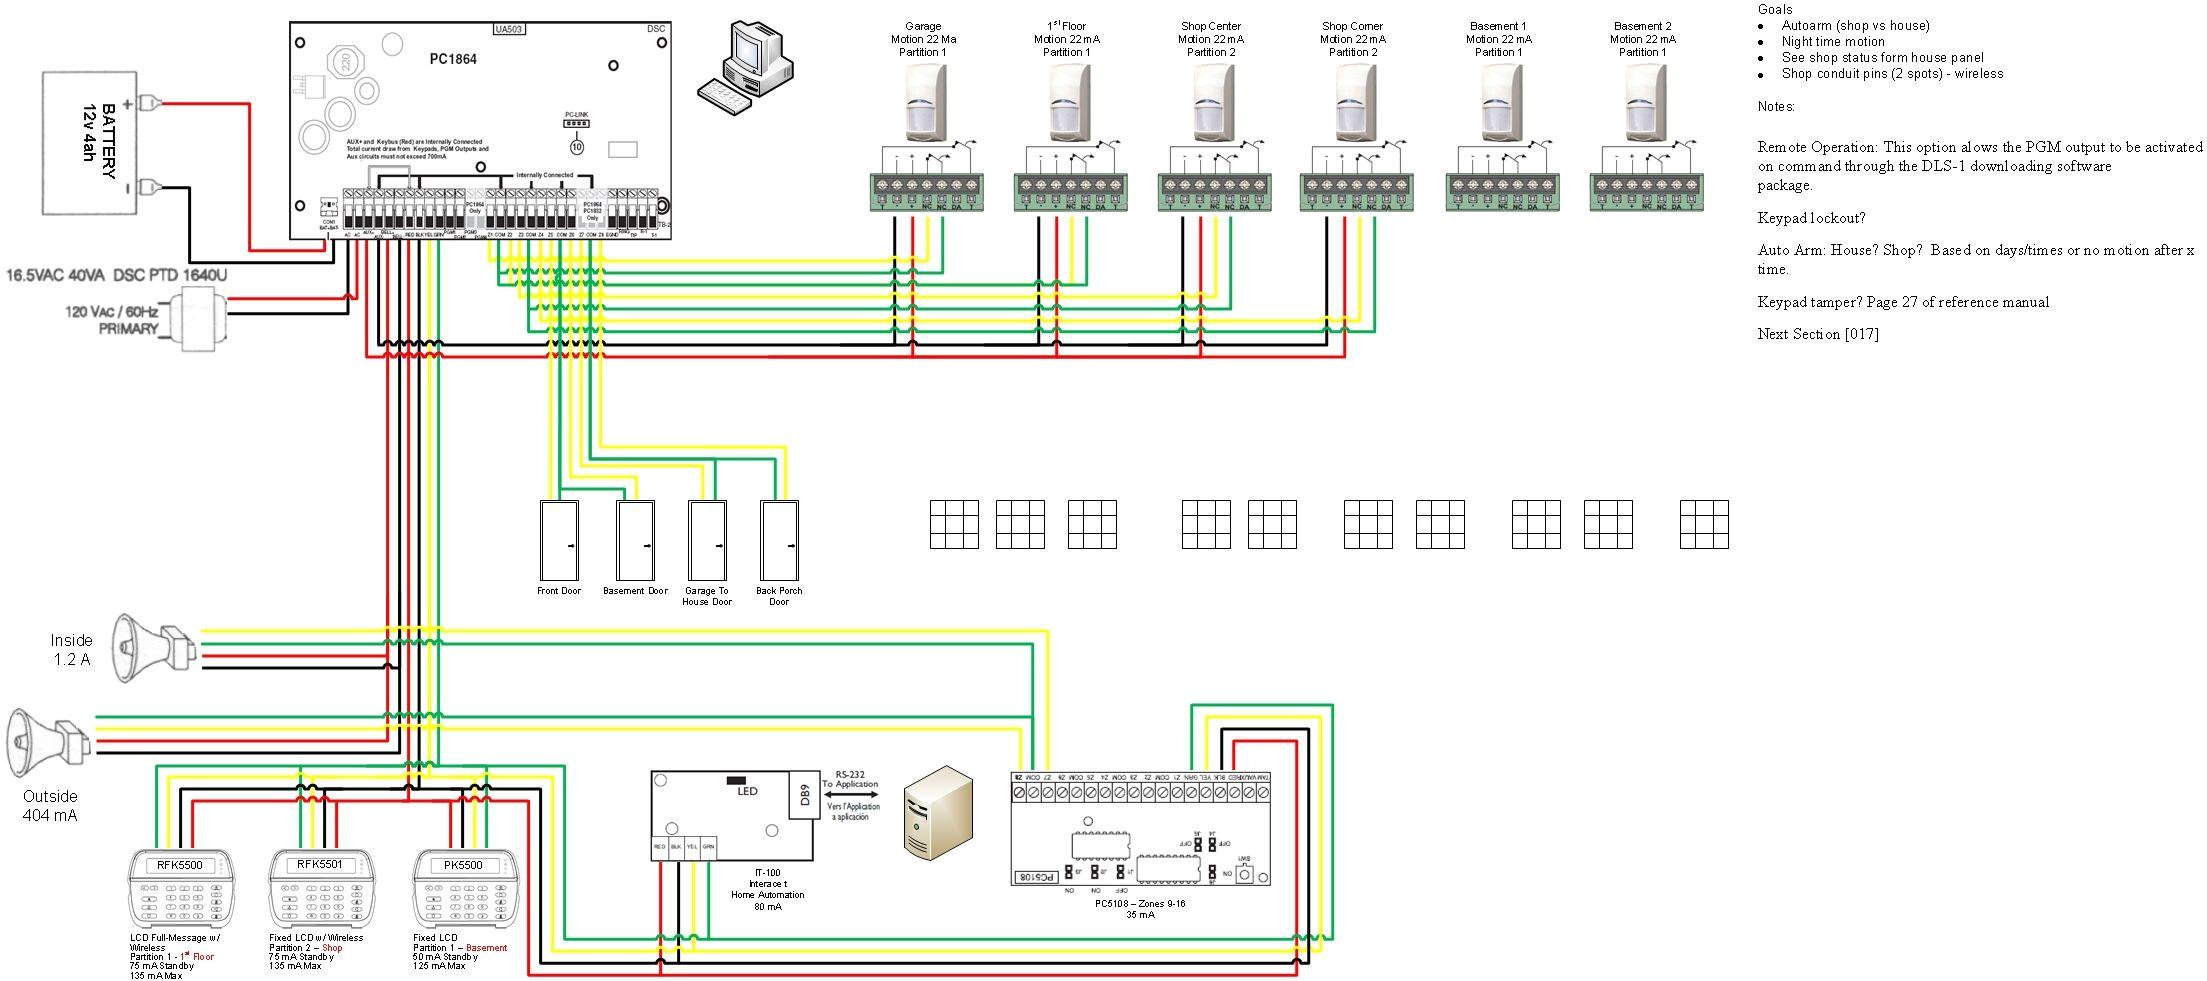 security wiring plans wiring diagram operations security cameras wiring diagrams security system wiring diagrams diagram inside